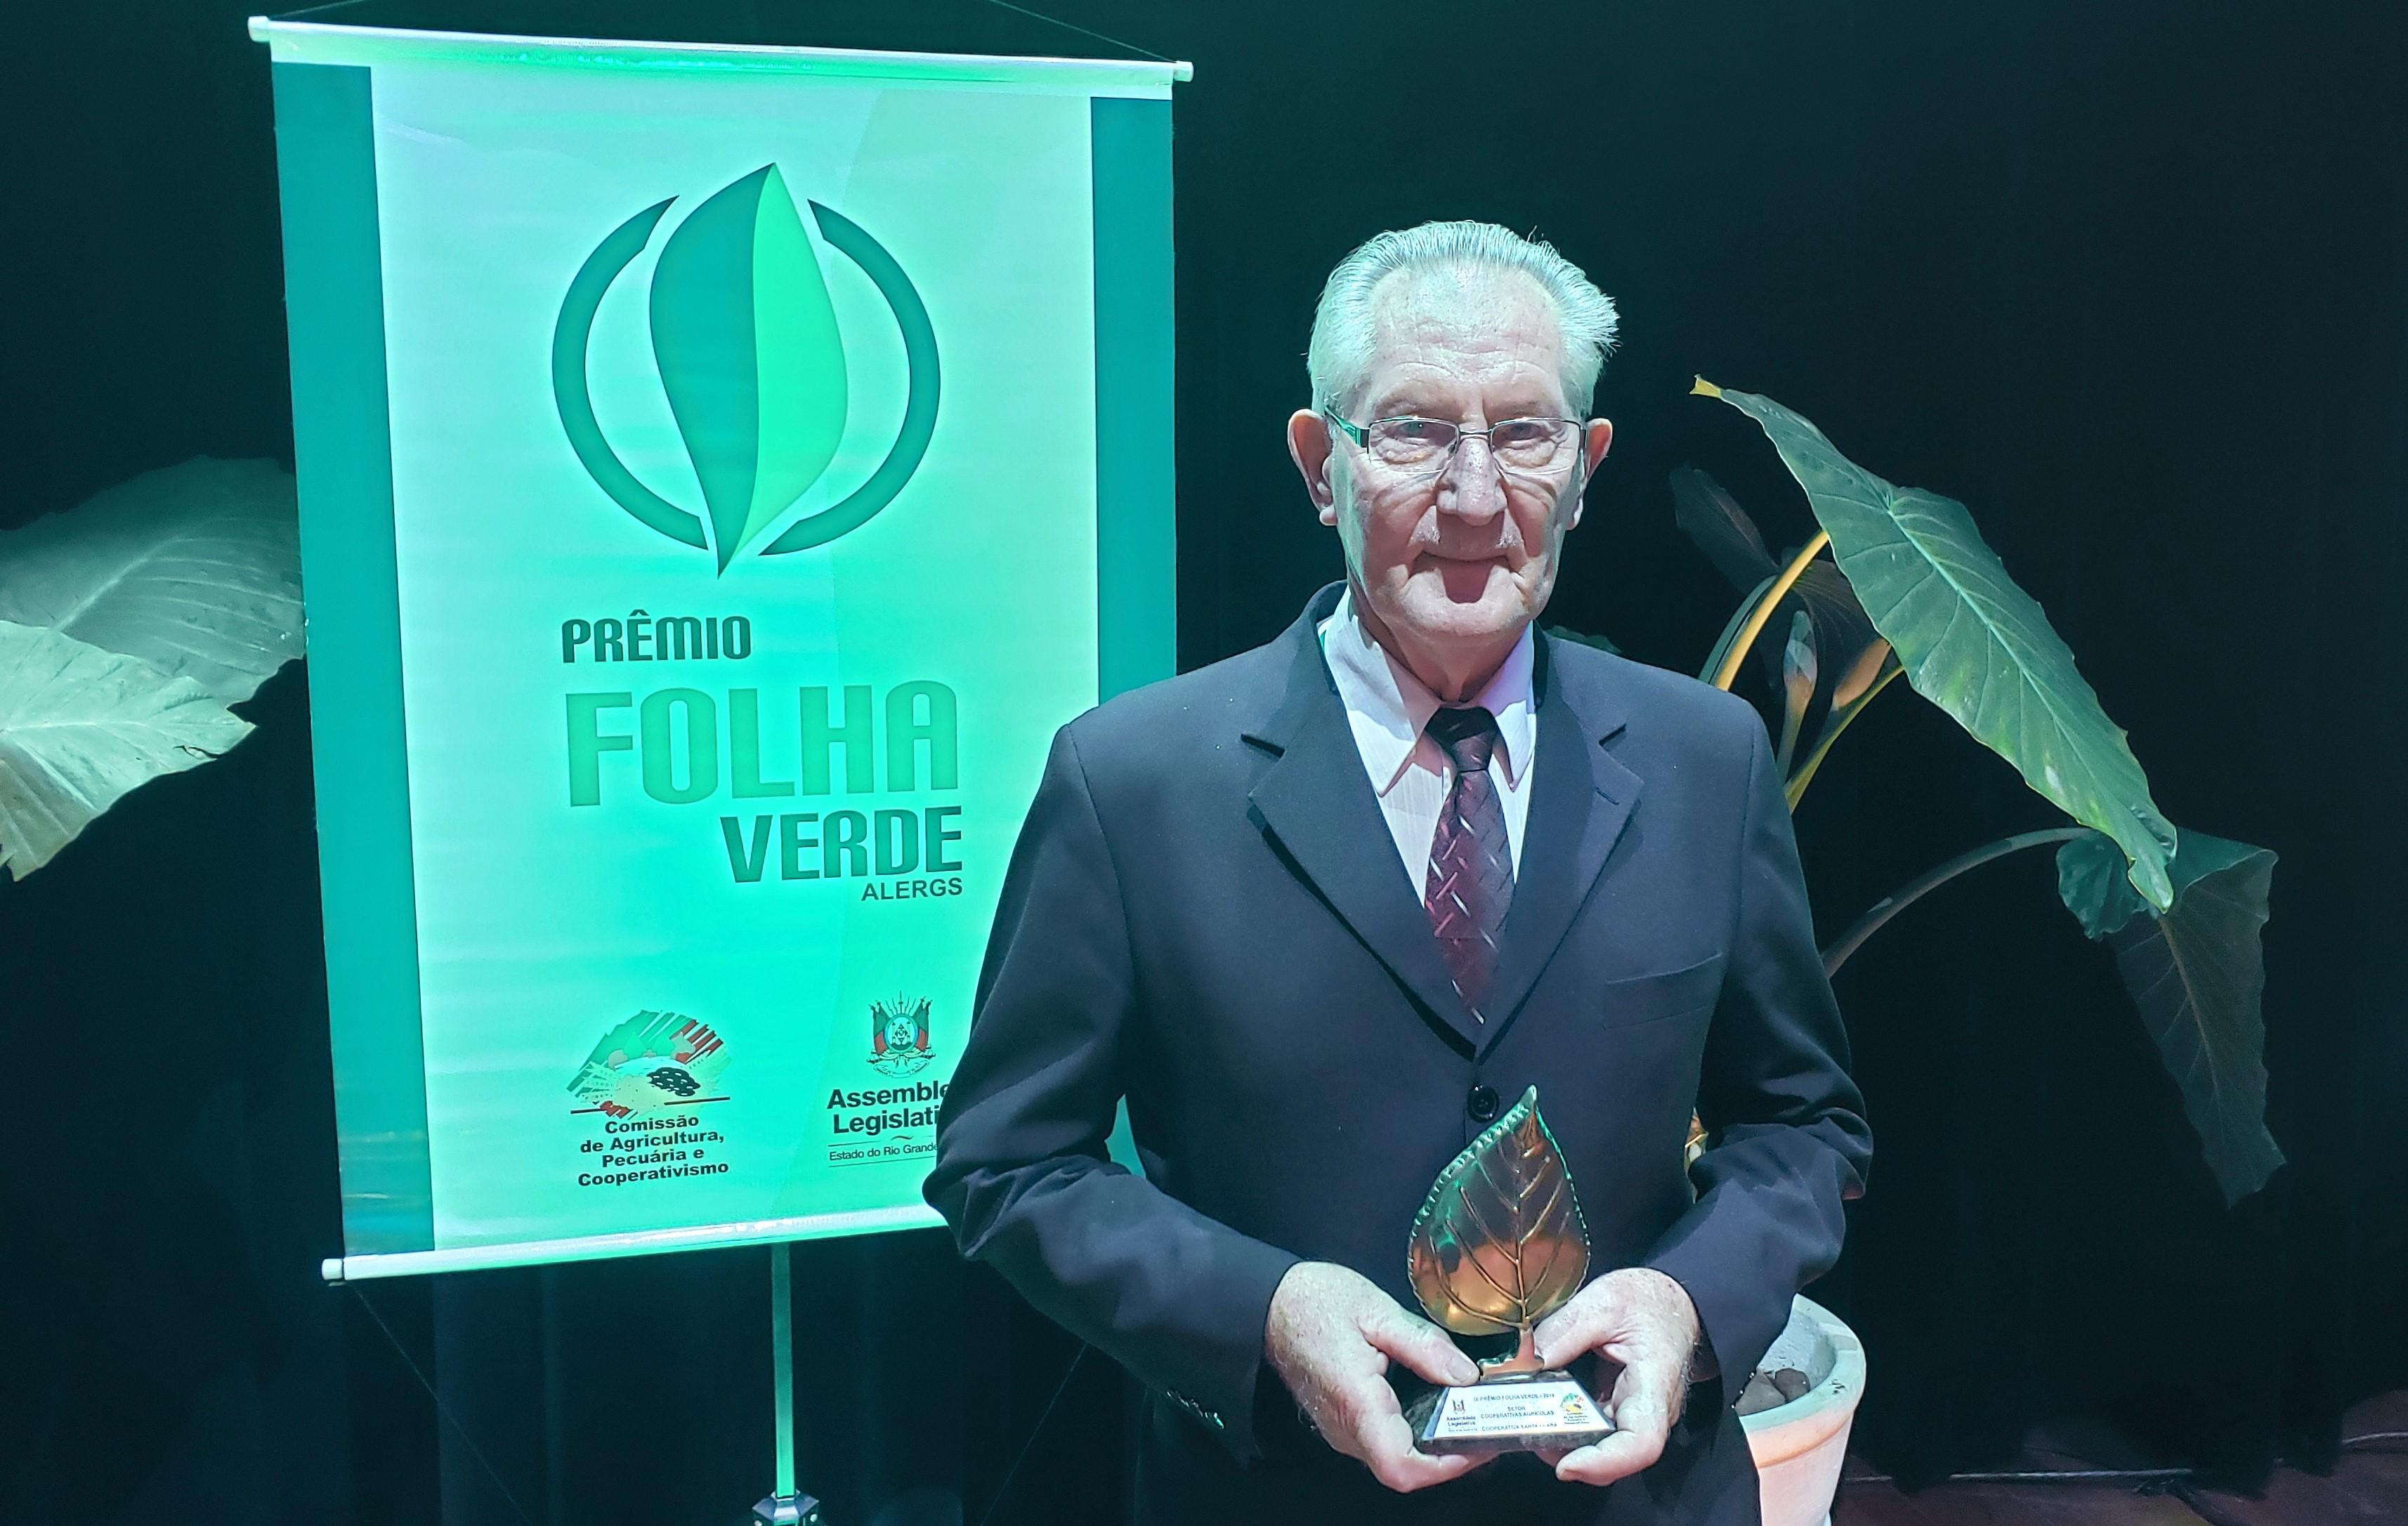 Santa Clara recebe o Prêmio Folha Verde da Assembleia Legislativa